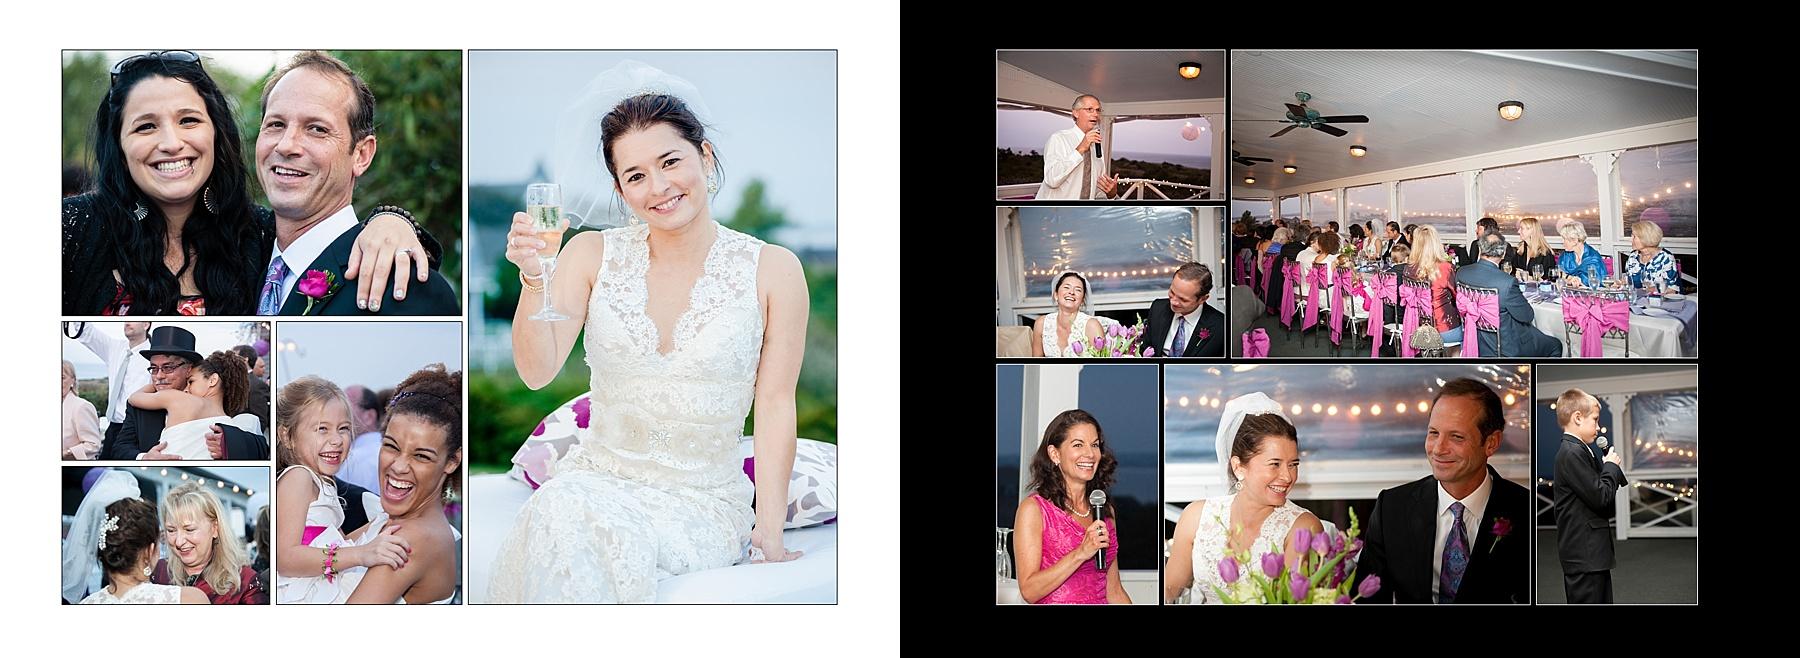 spread15_Wedding Album_Block Island RI WEB.jpg